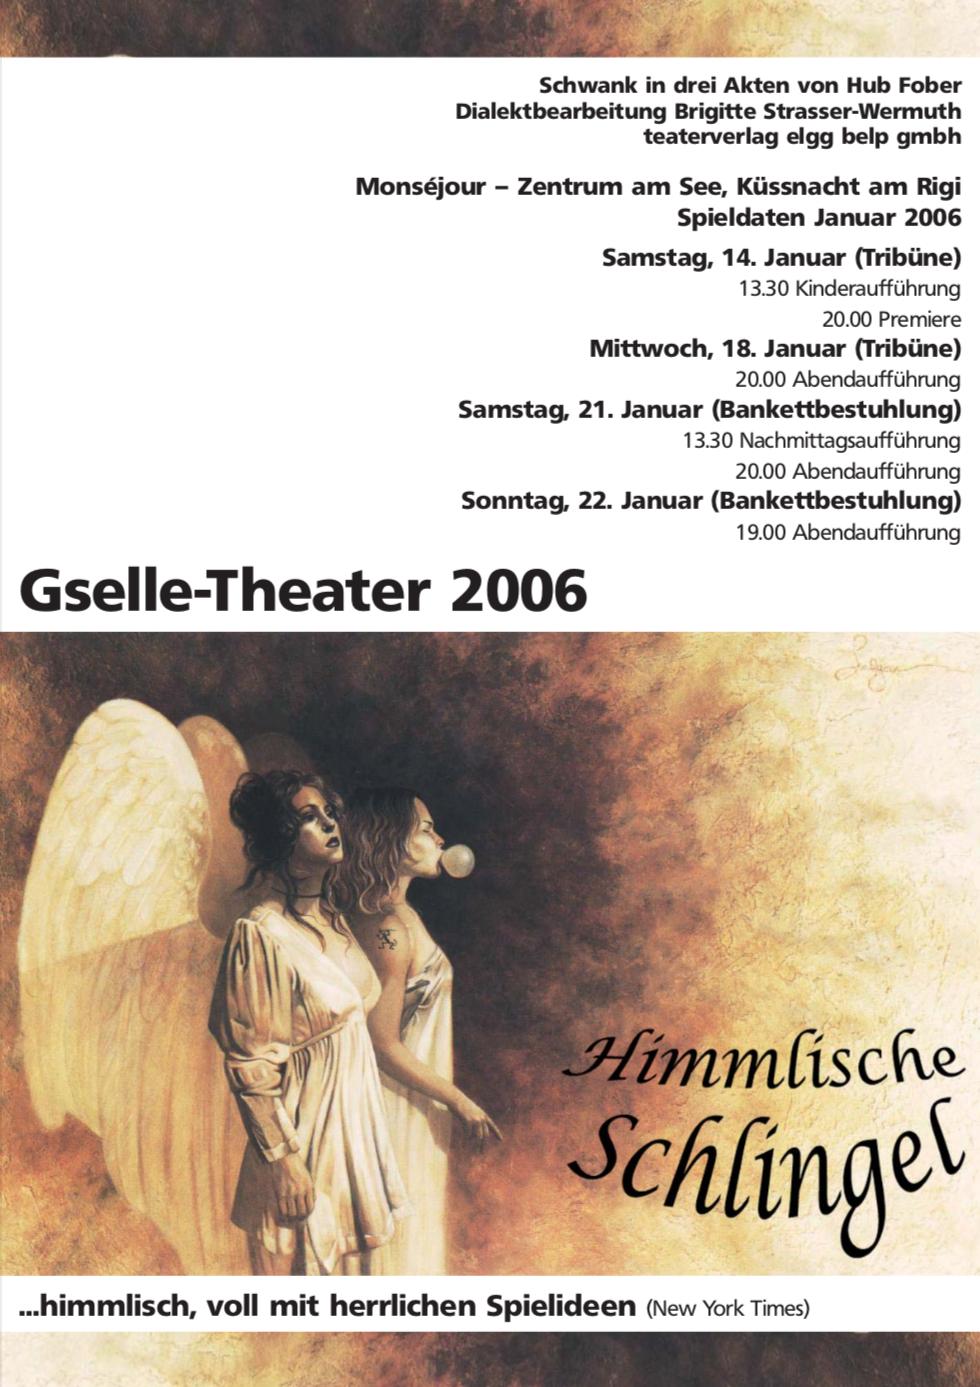 Himmlischi Schlingel 2006 - Flyer